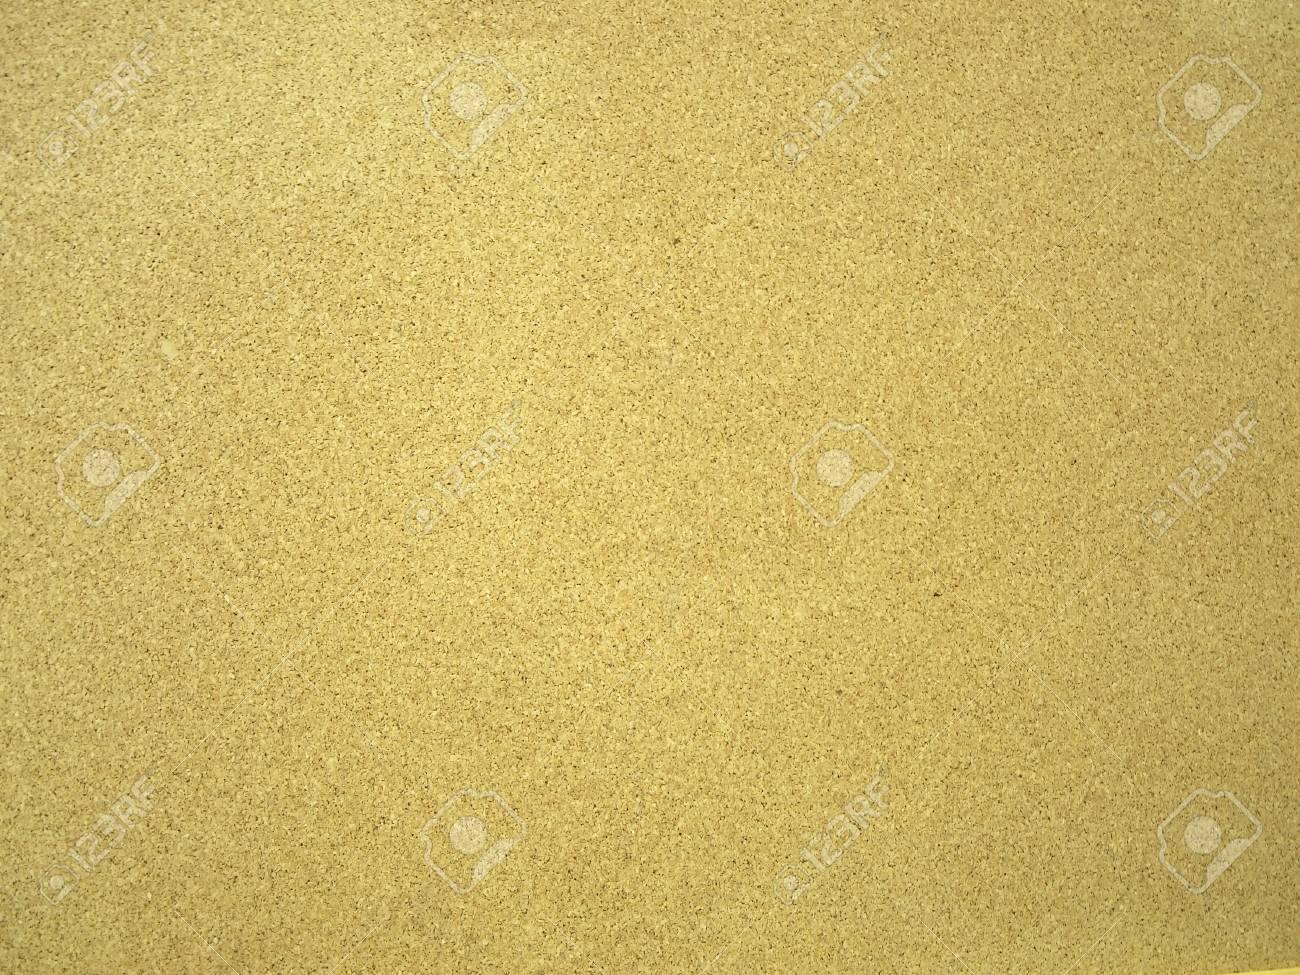 Cork background Stock Photo - 14850177